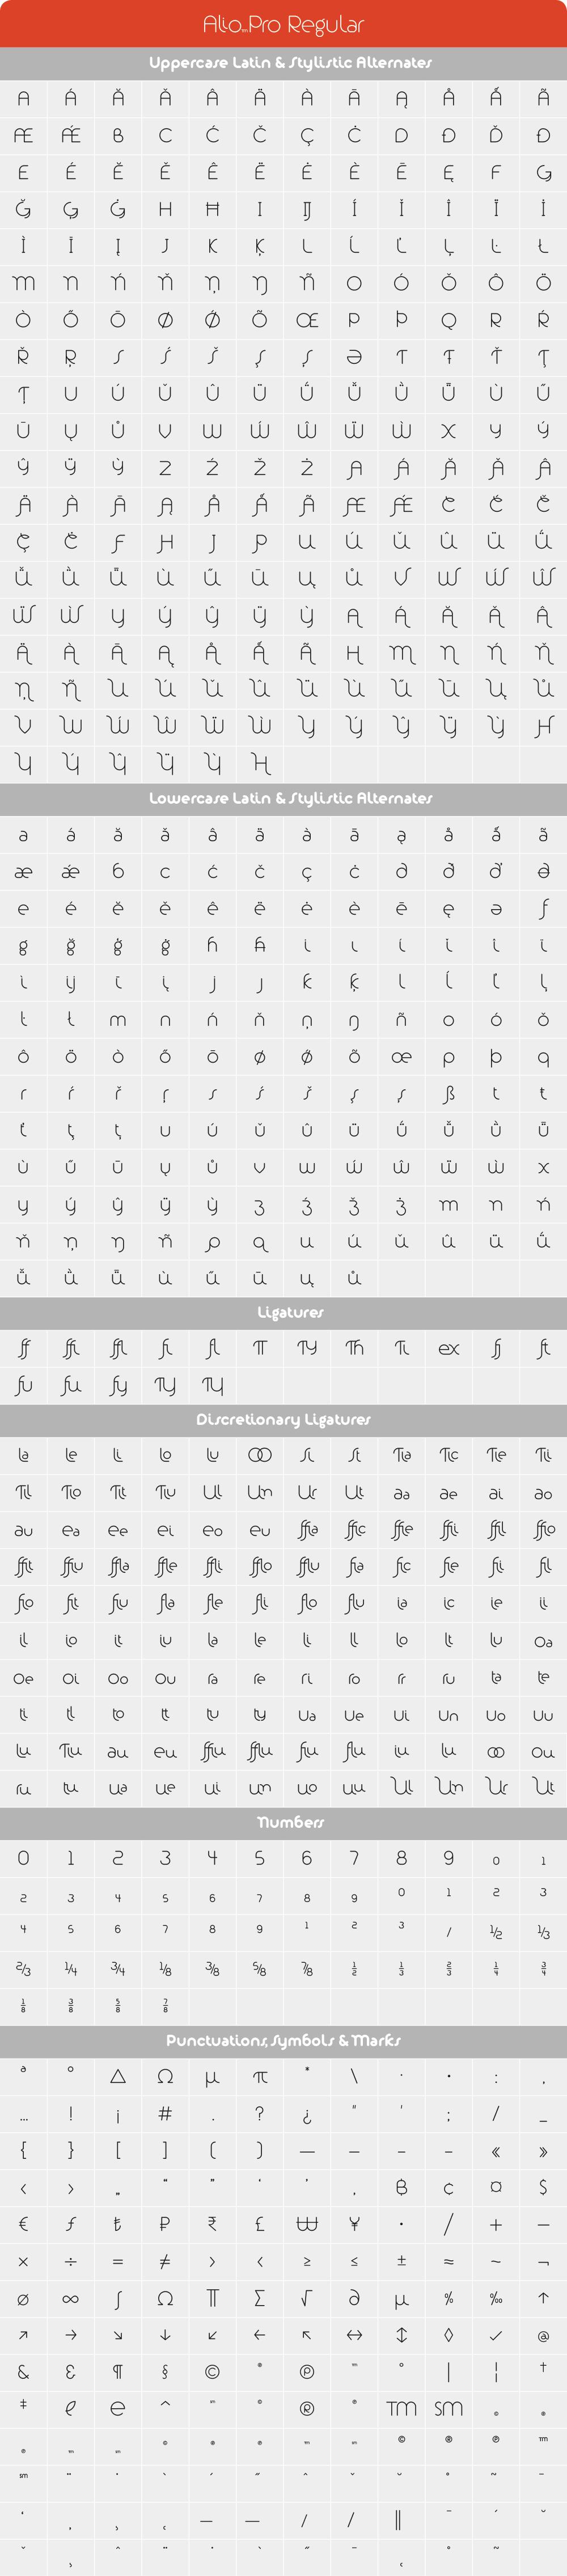 Alio Pro Regular Glyph Set